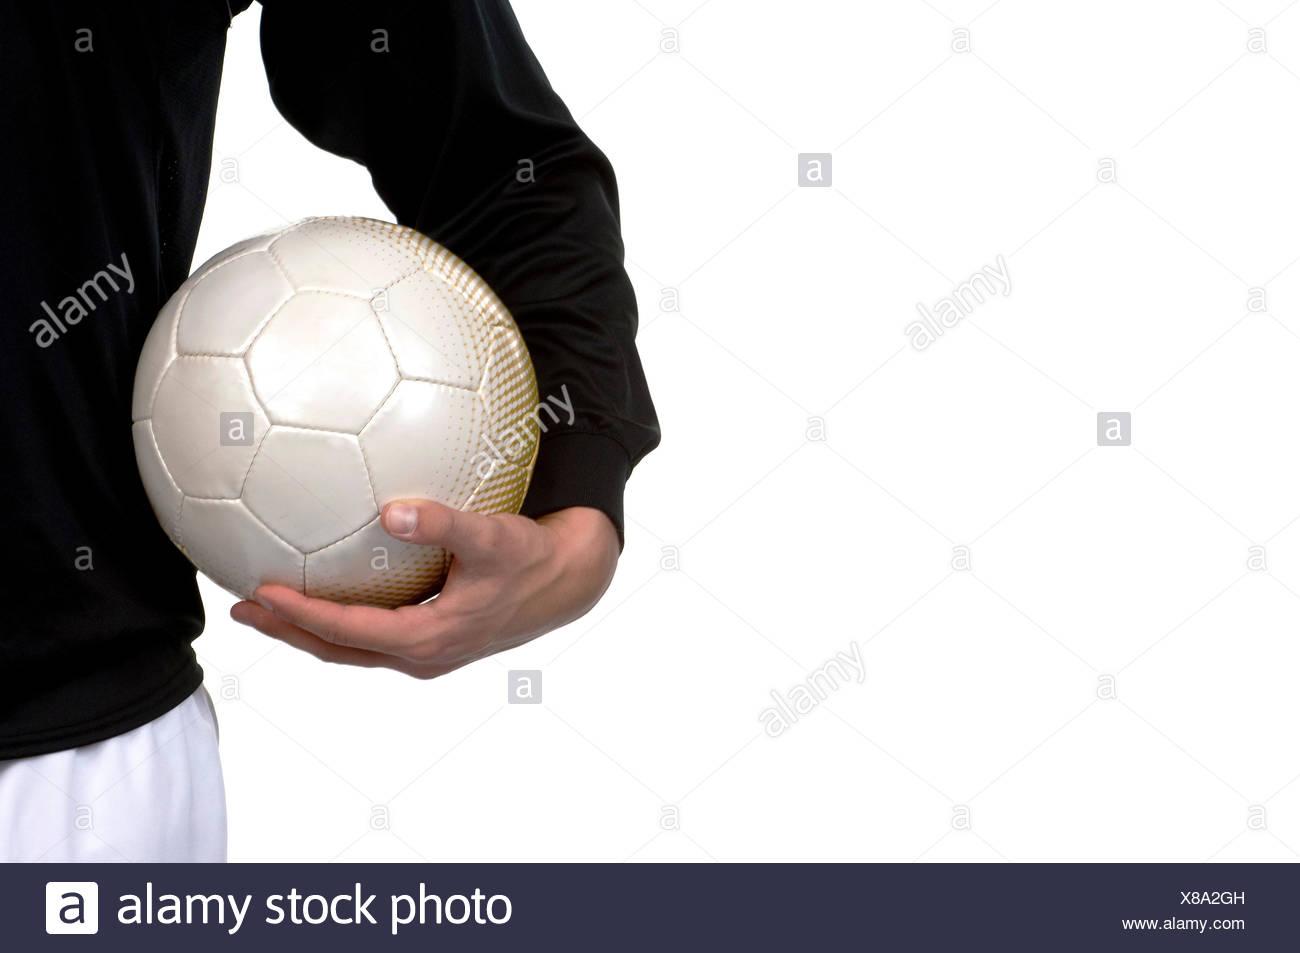 footballer - Stock Image